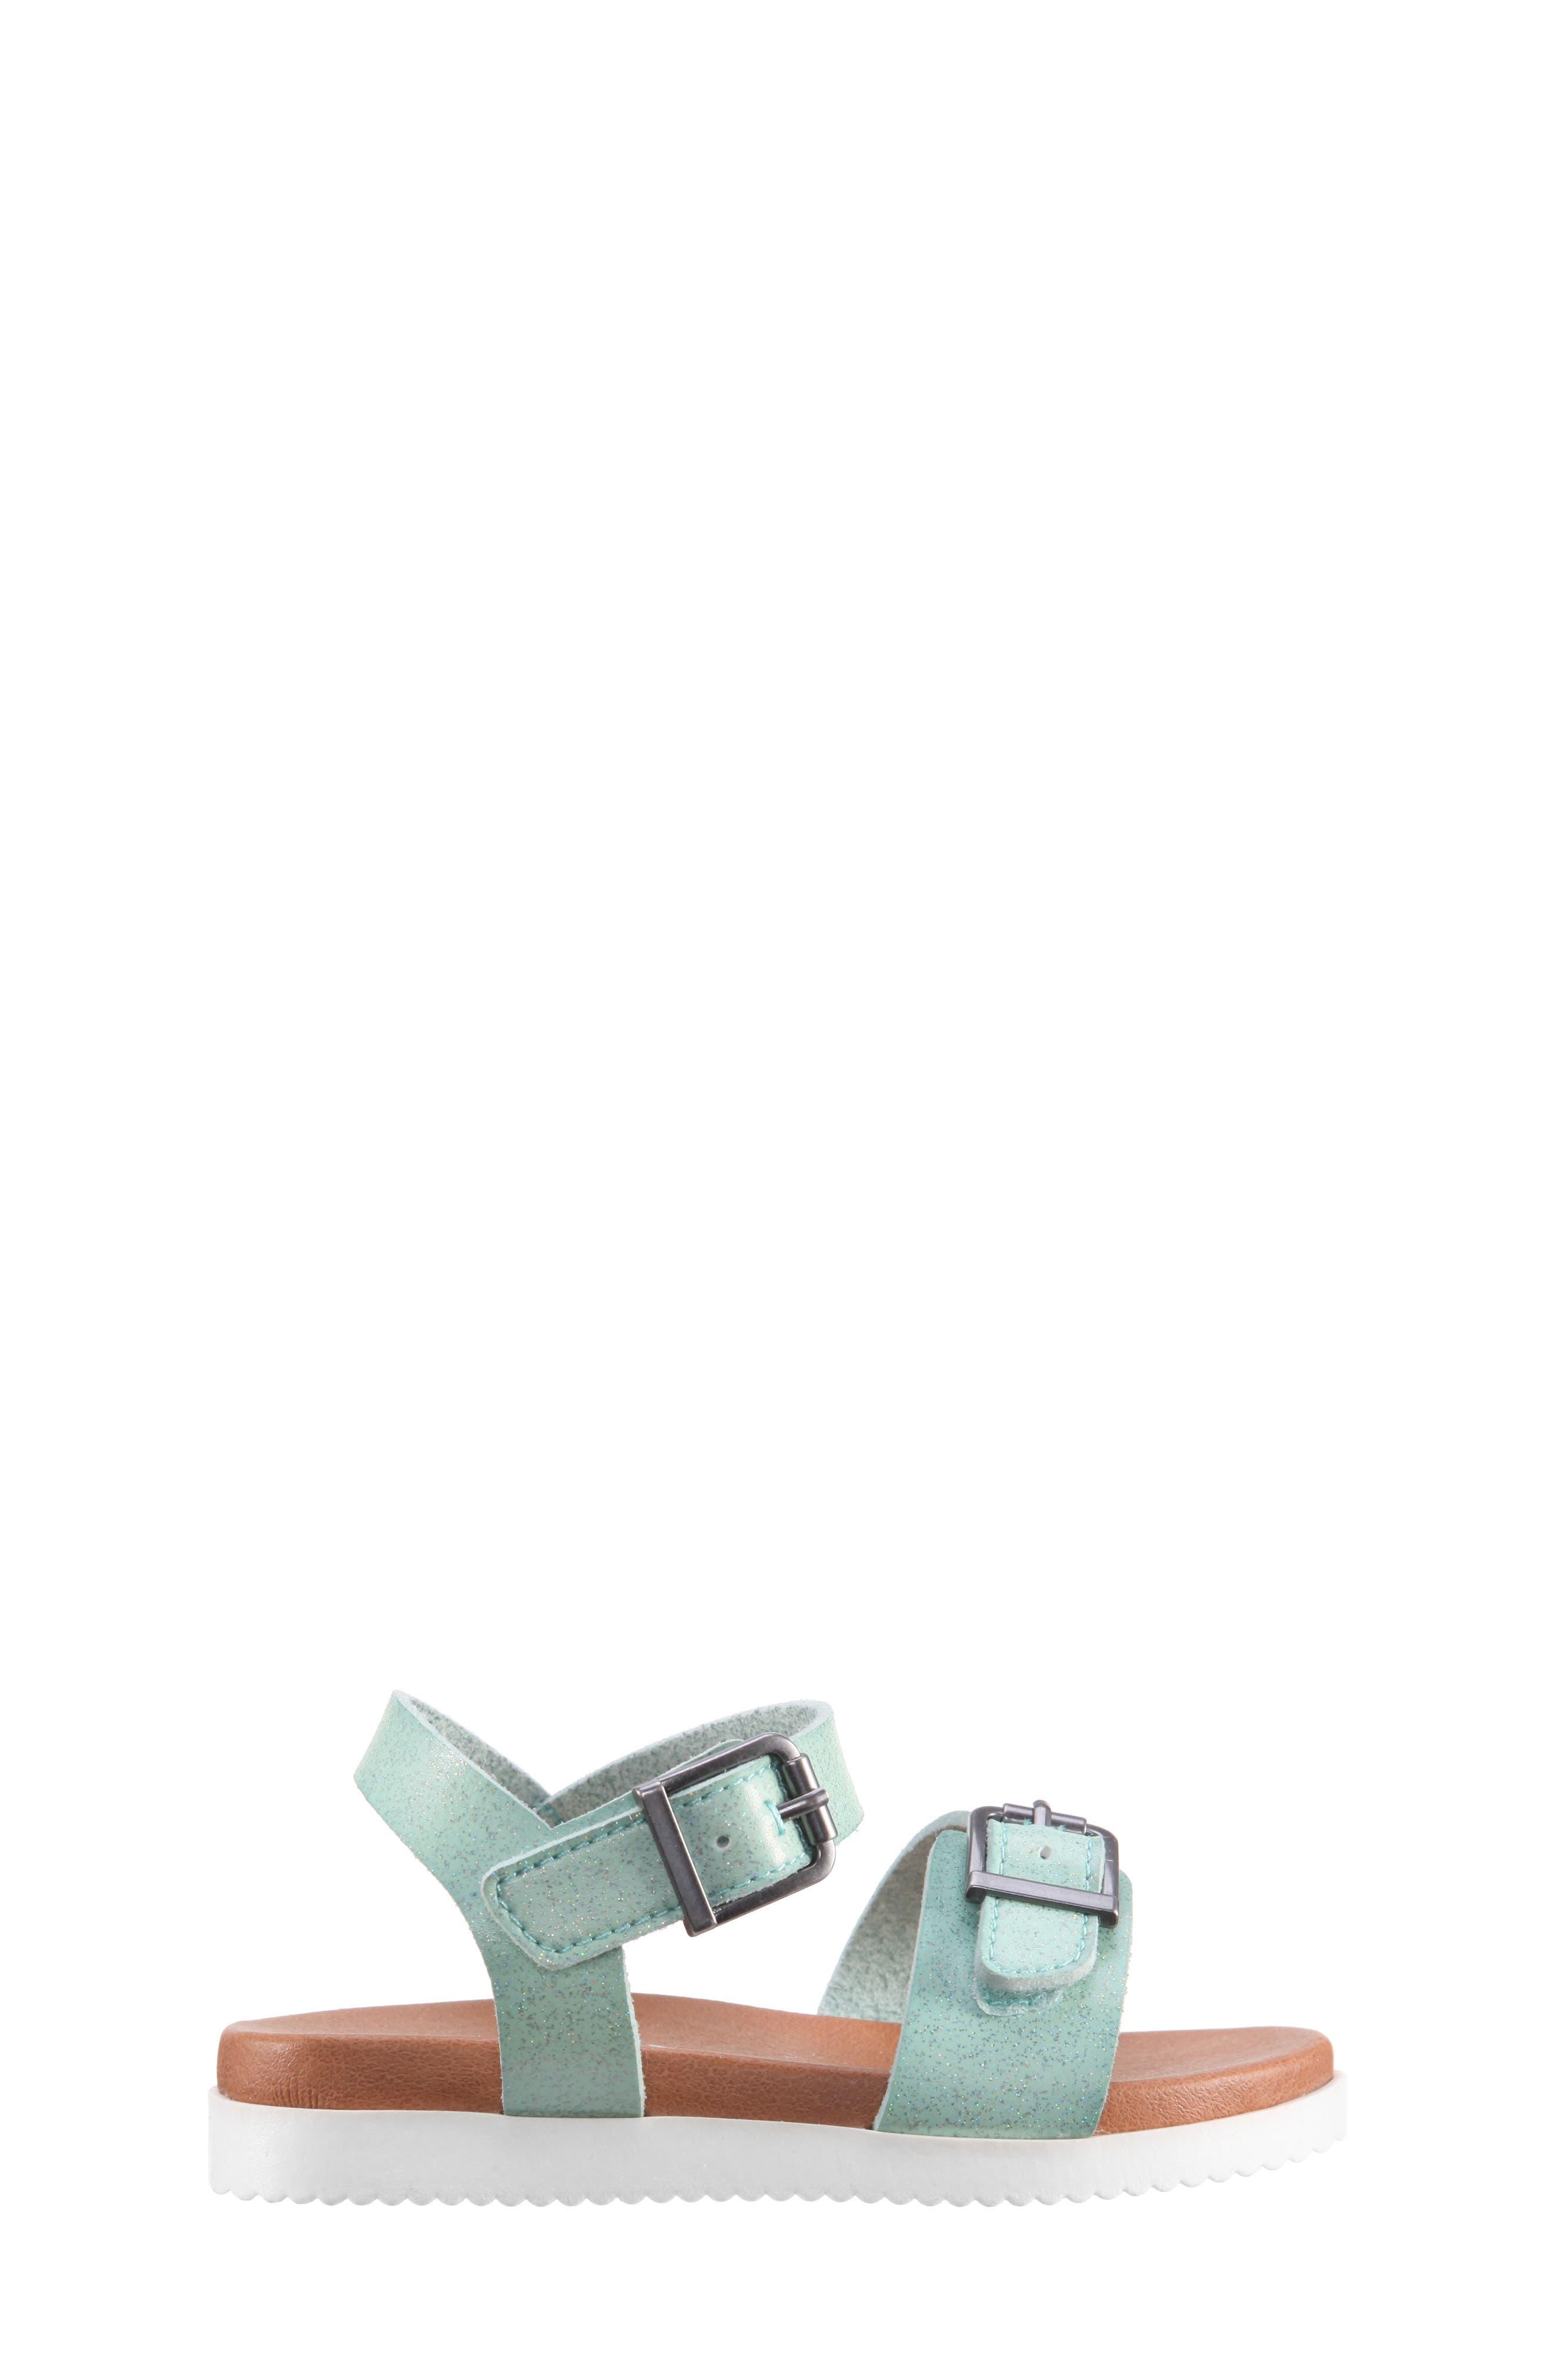 Jacklin3 Quarter Strap Sandal,                             Alternate thumbnail 3, color,                             Mint Dip Dye